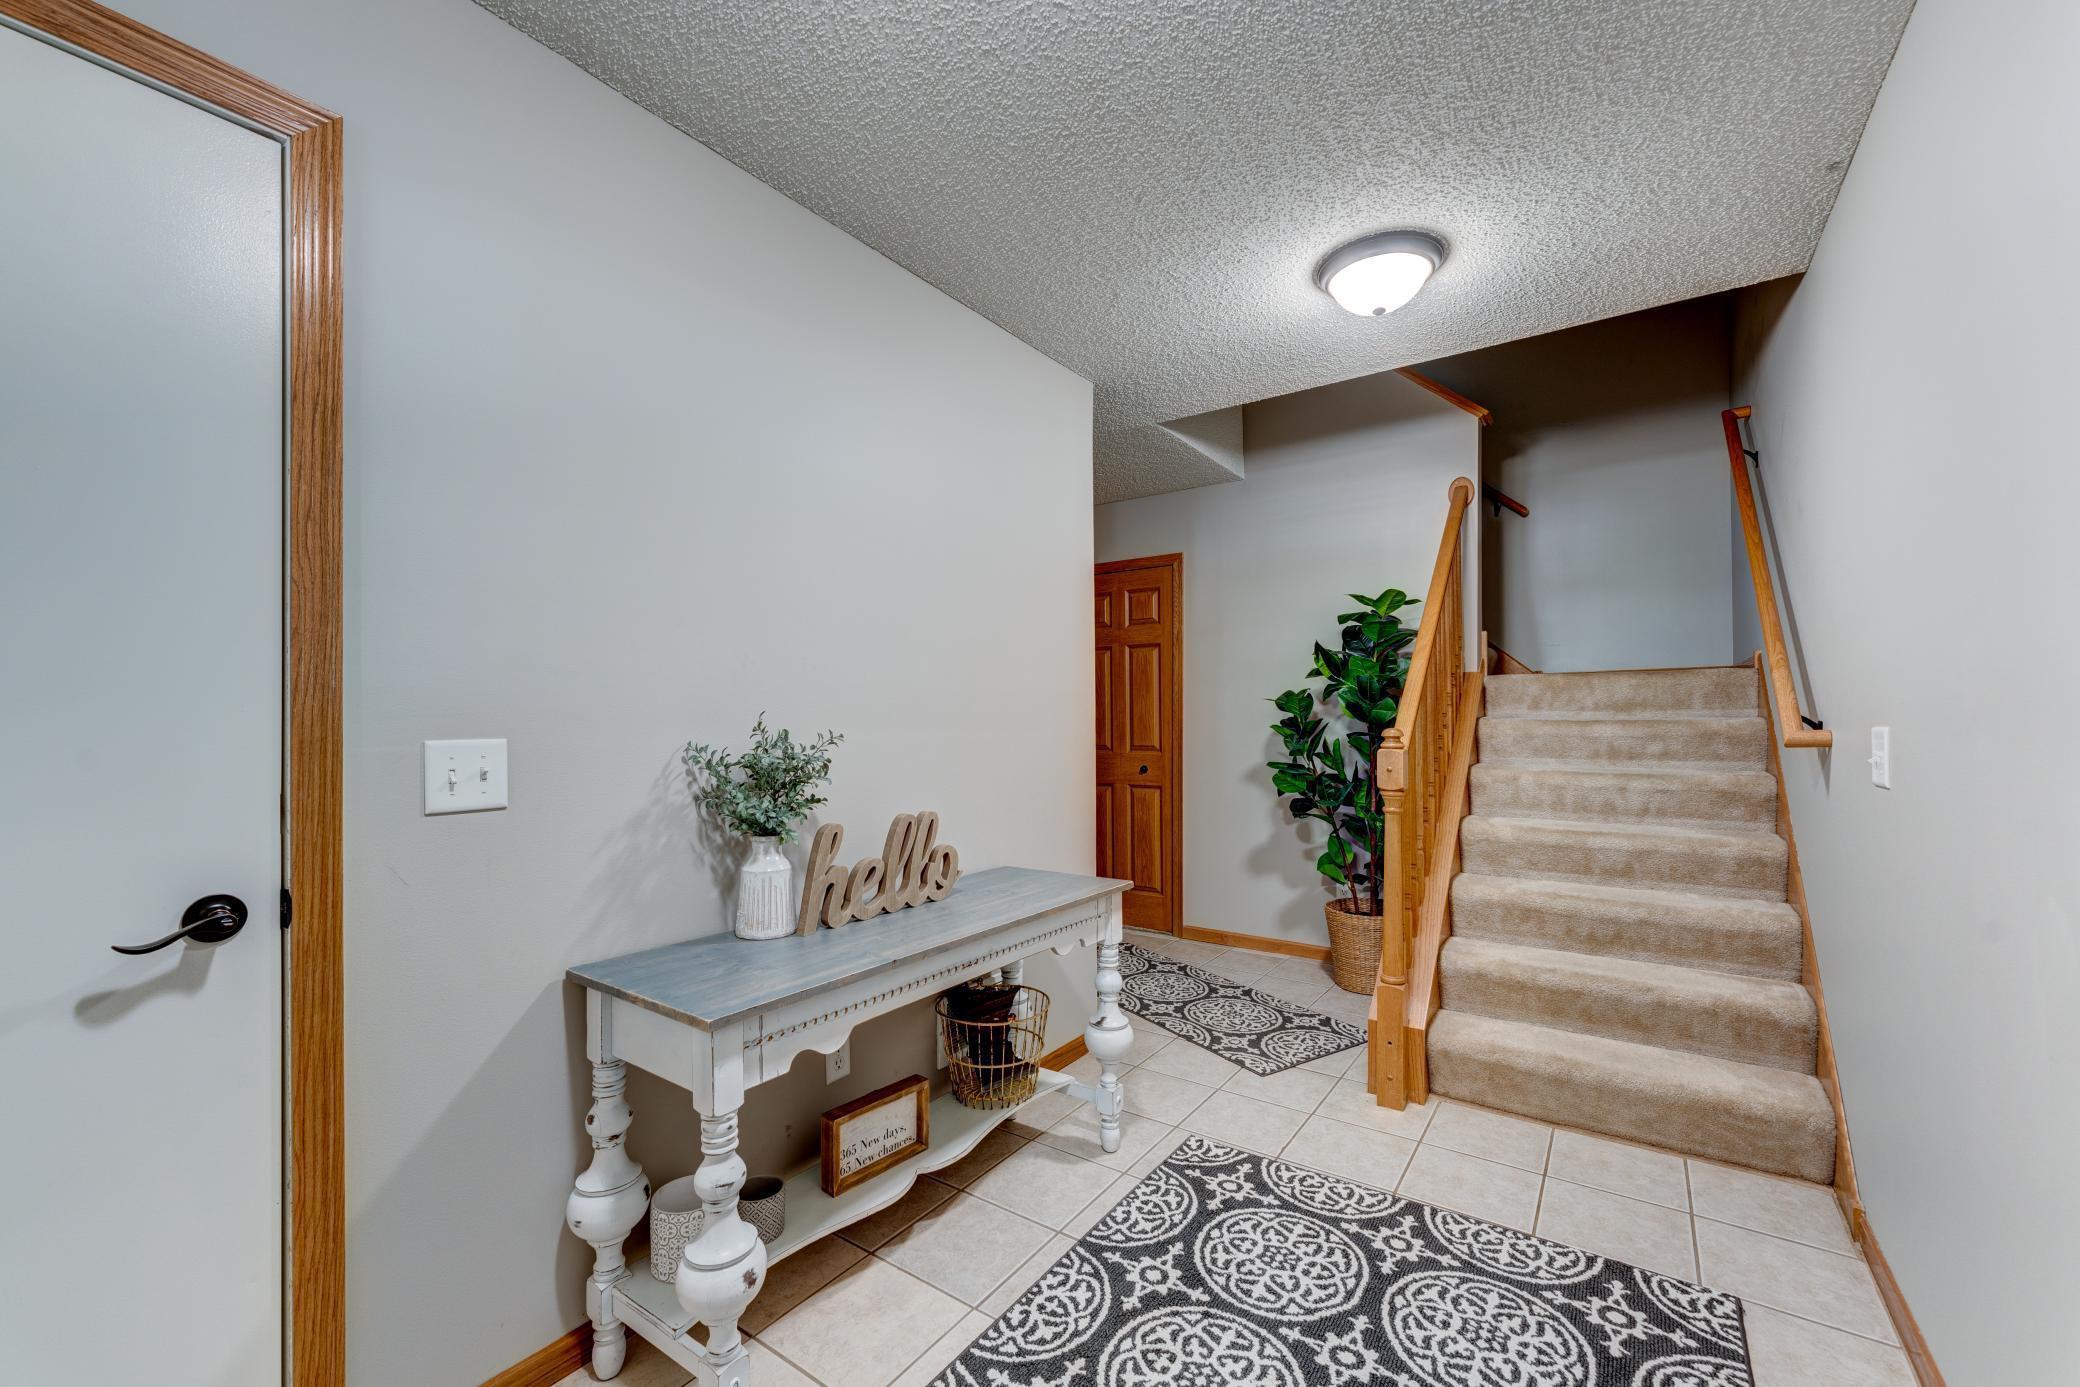 6772 Pine Crest Trail S, Cottage Grove, MN 55016